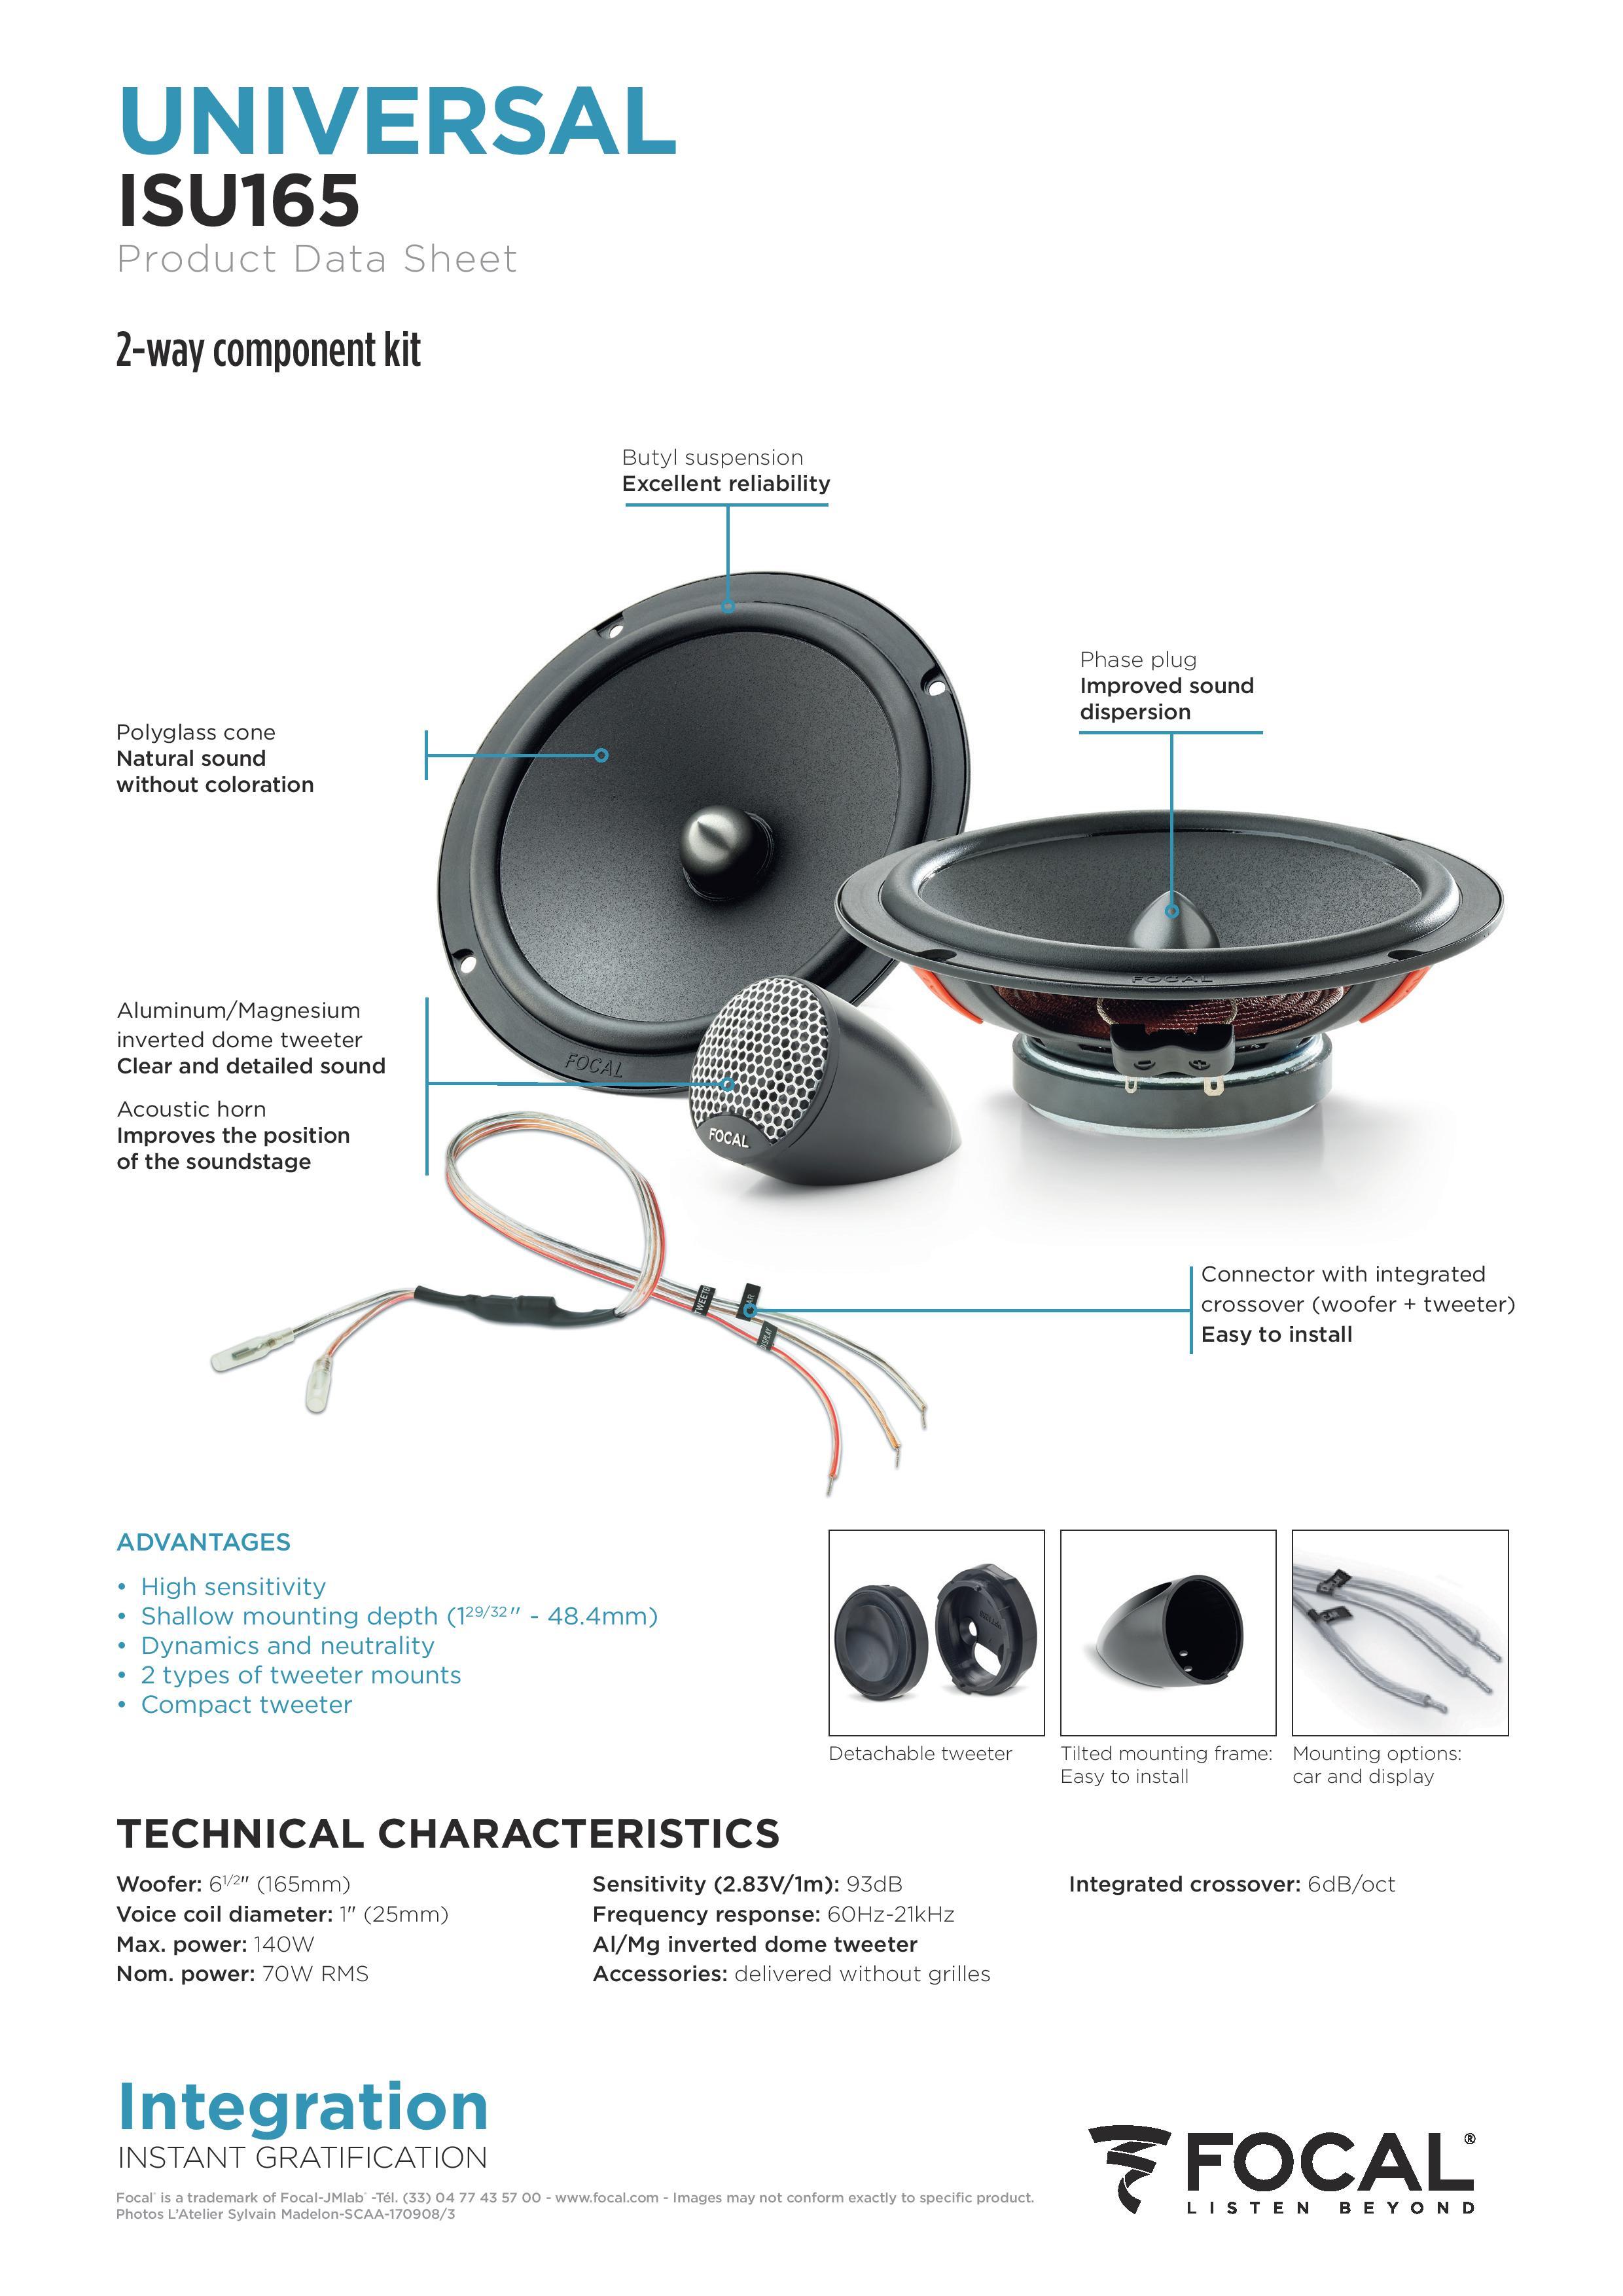 https://c.76.my/Malaysia/focal-integration-universal-isu-165-2-component-car-speakers-kklaucaraudio-1810-05-KKLAUCARAUDIO@2199.jpg